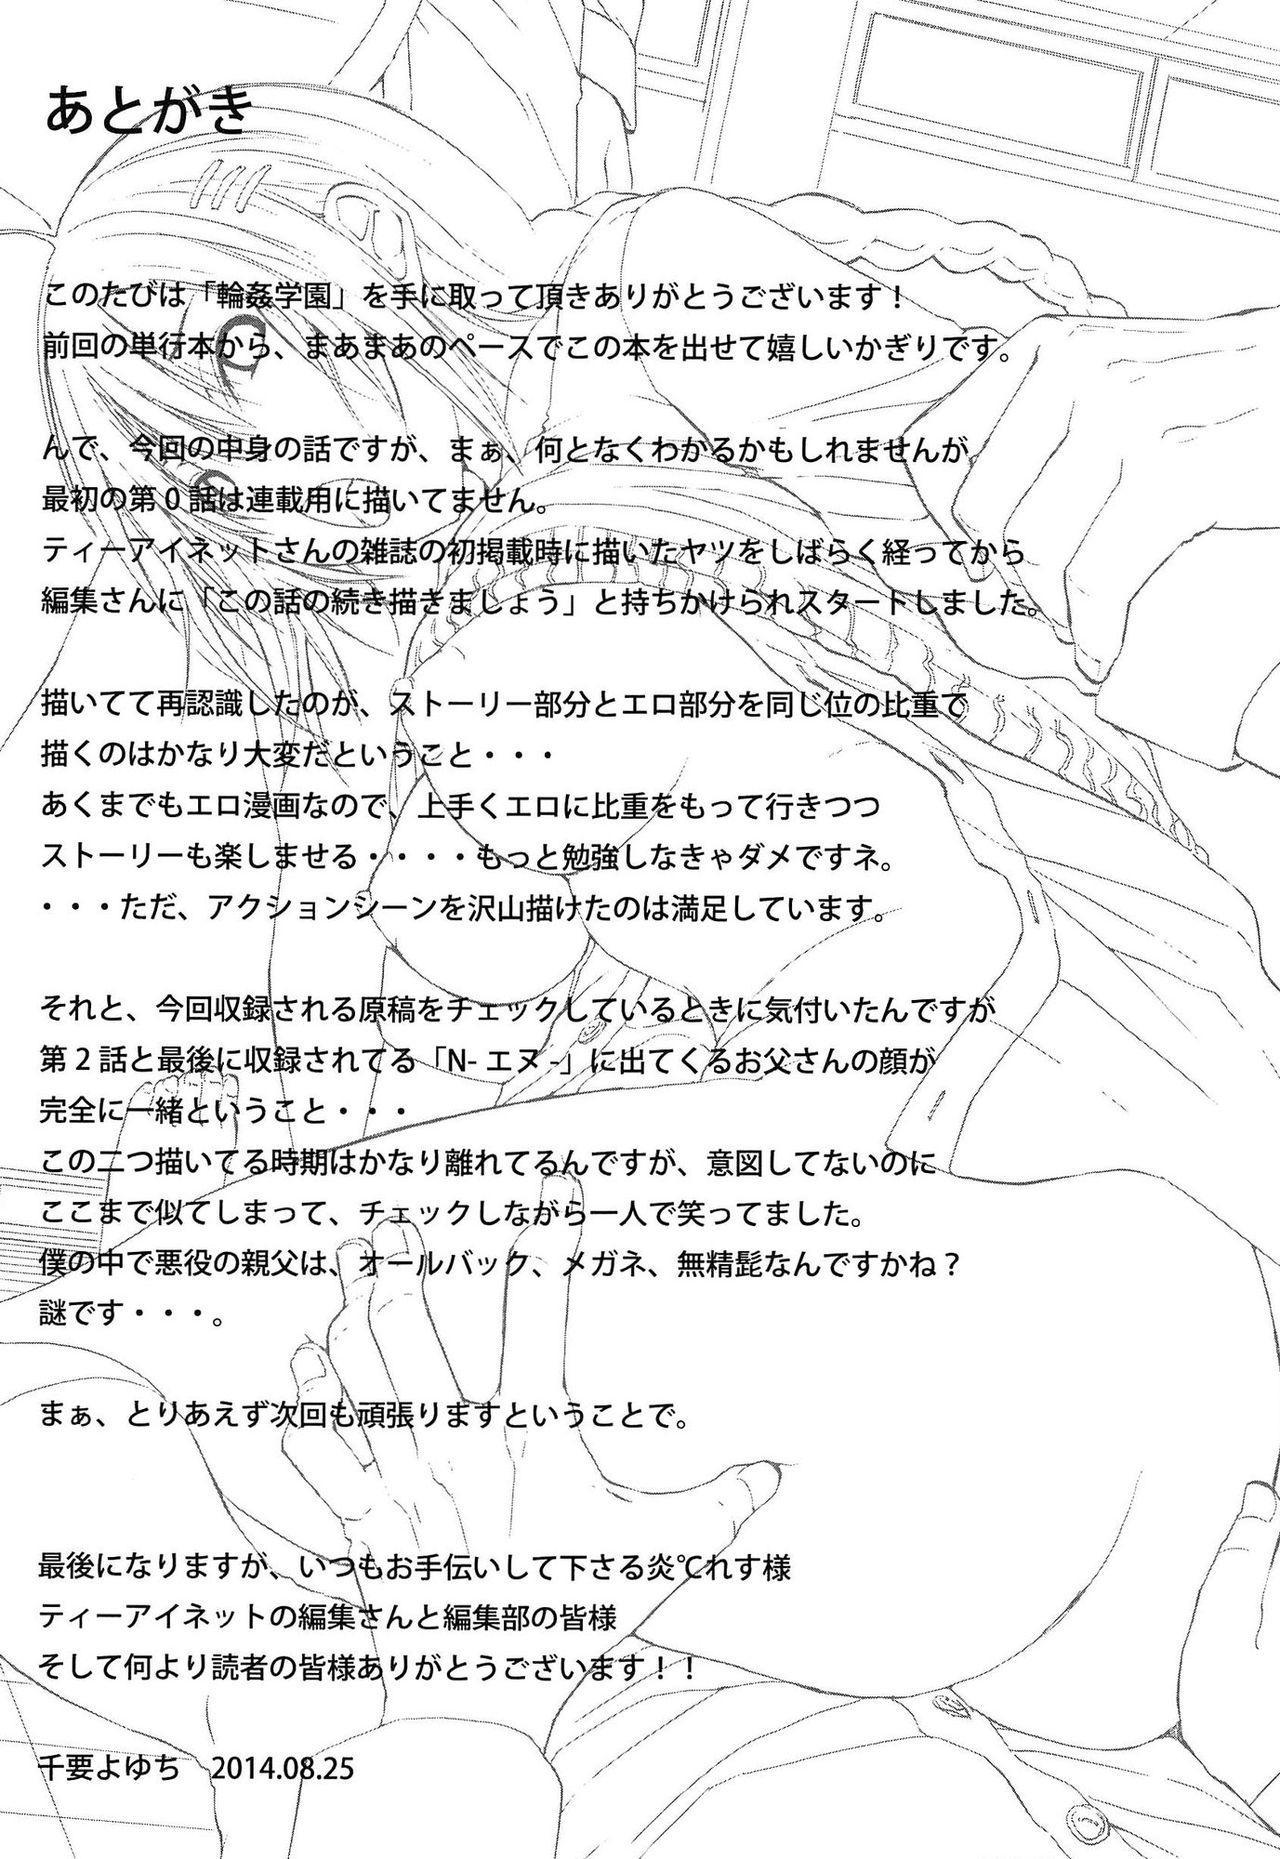 [Chiyou Yoyuchi] Rinkan Gakuen ~Haibokusha-tachi wa Midaremau~   Gang Rape School: The Losers Dance Indecently [English] 204